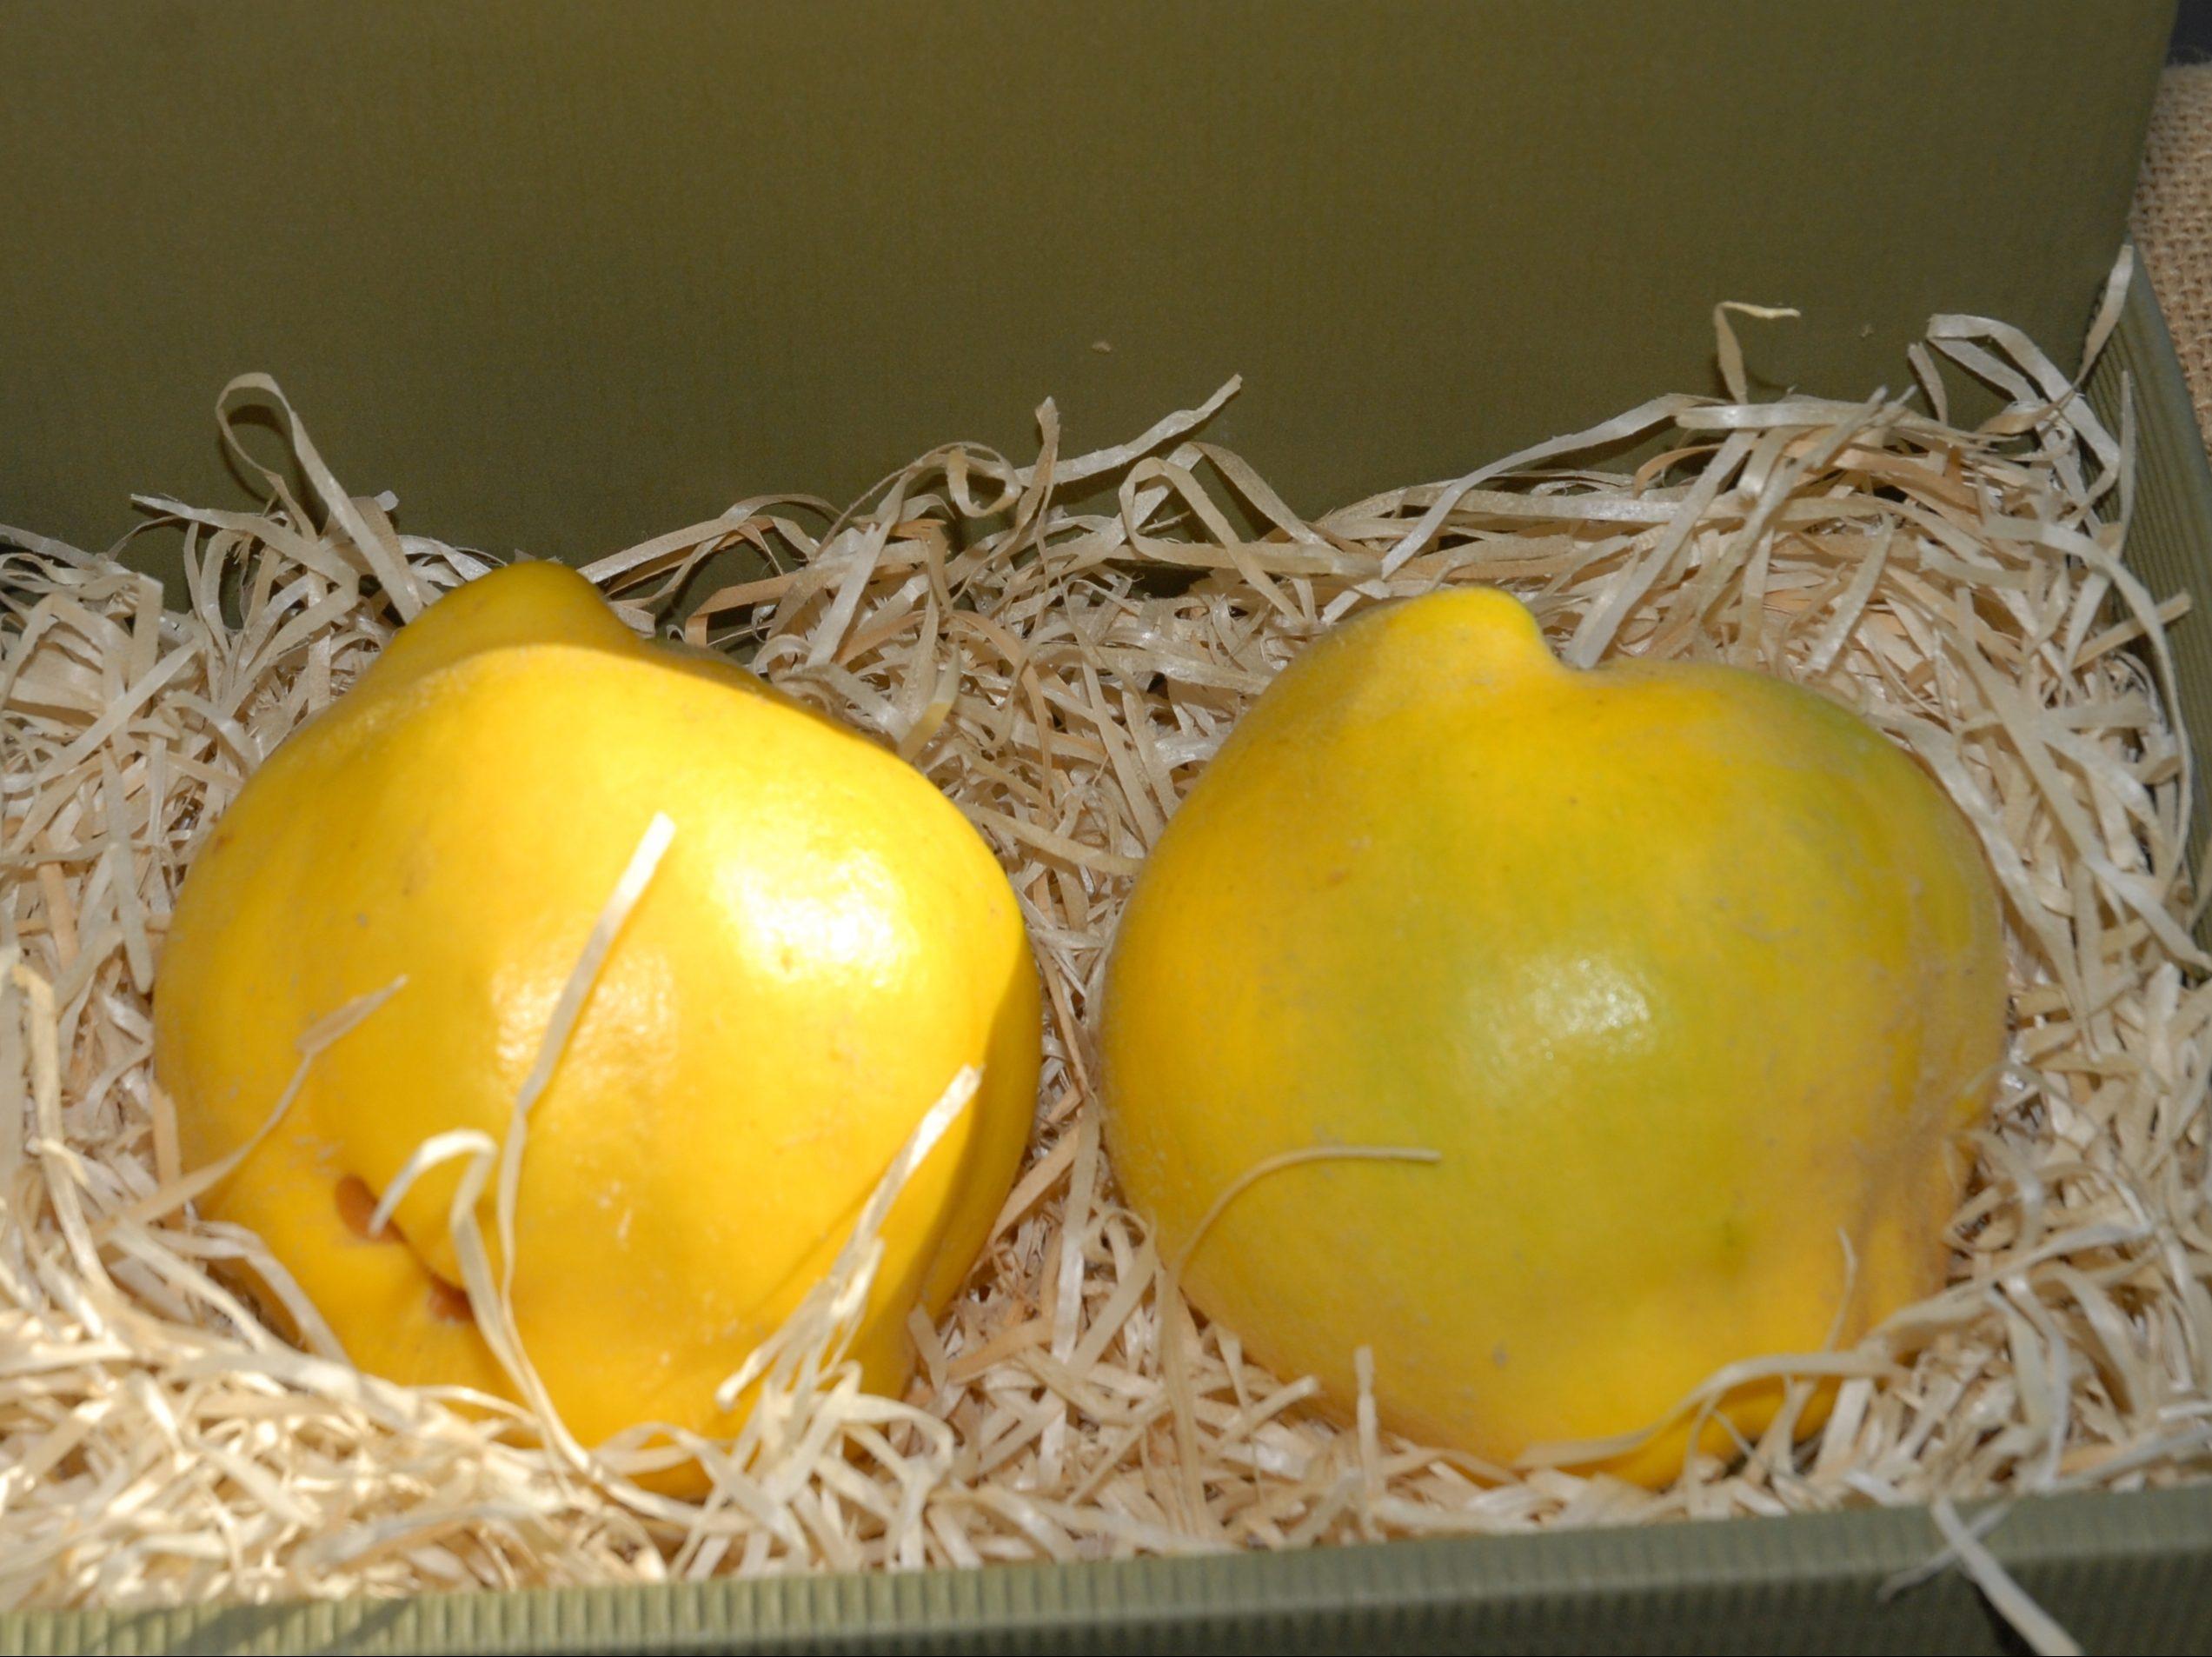 Quitte 'Bereczki' – Apfelförmig